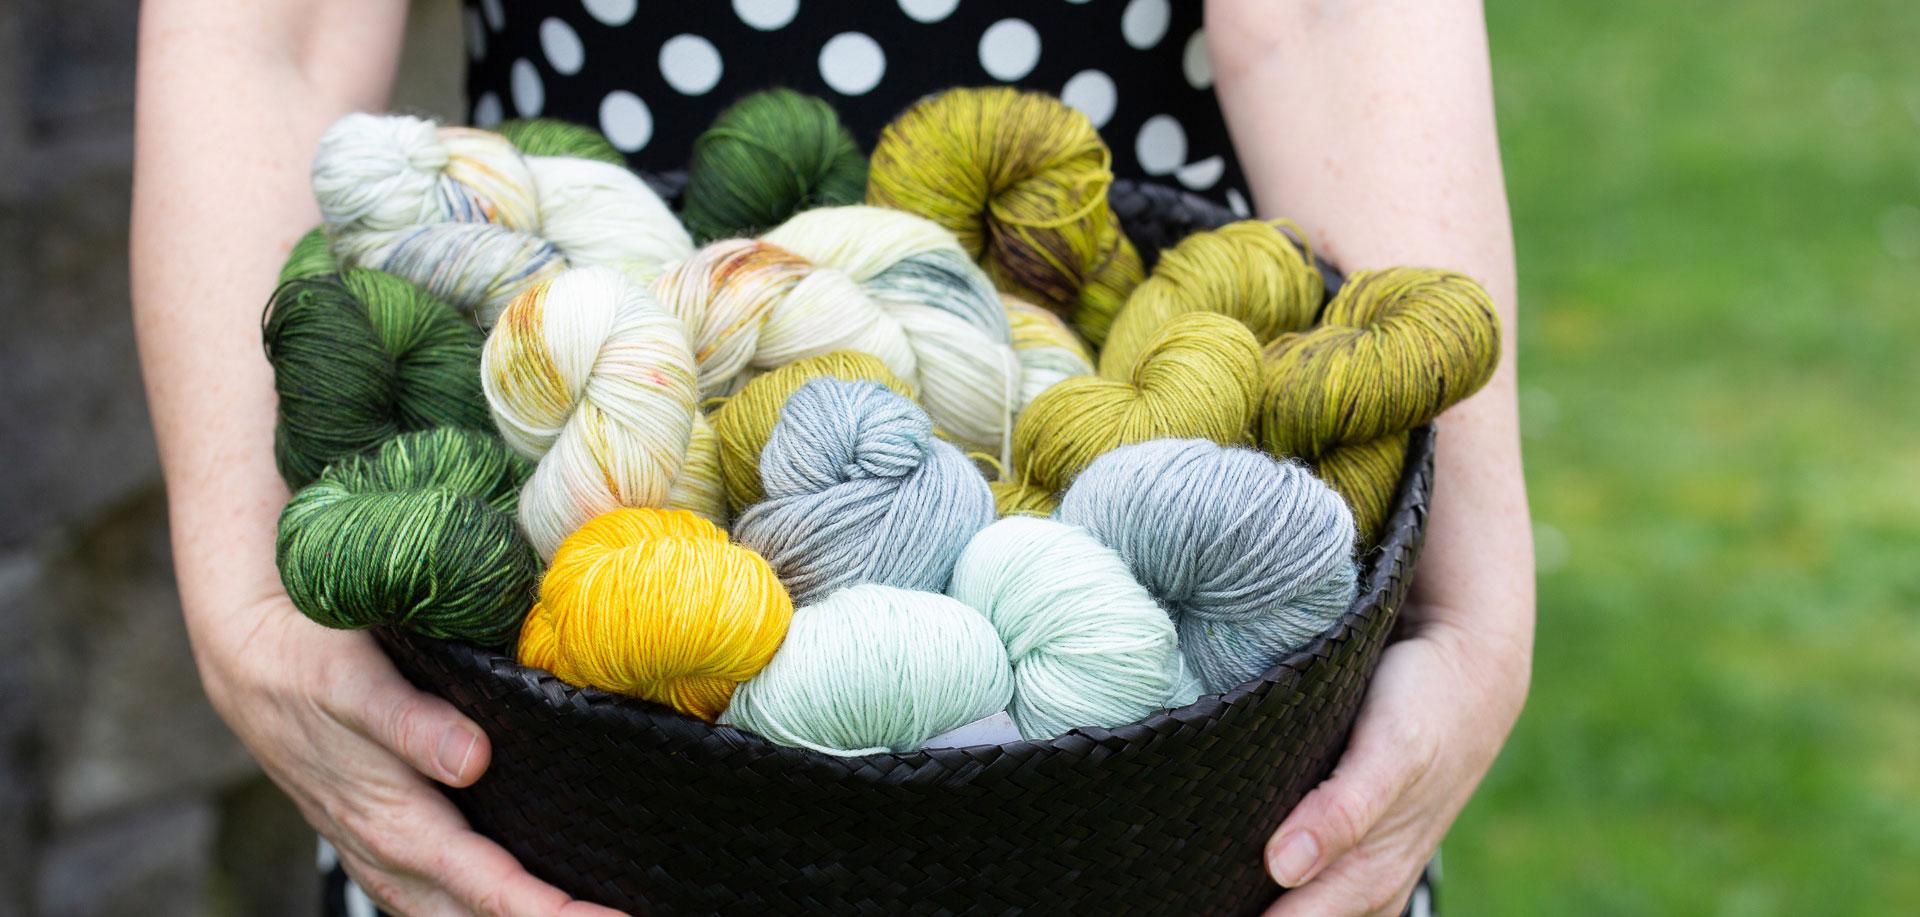 holding-yarn